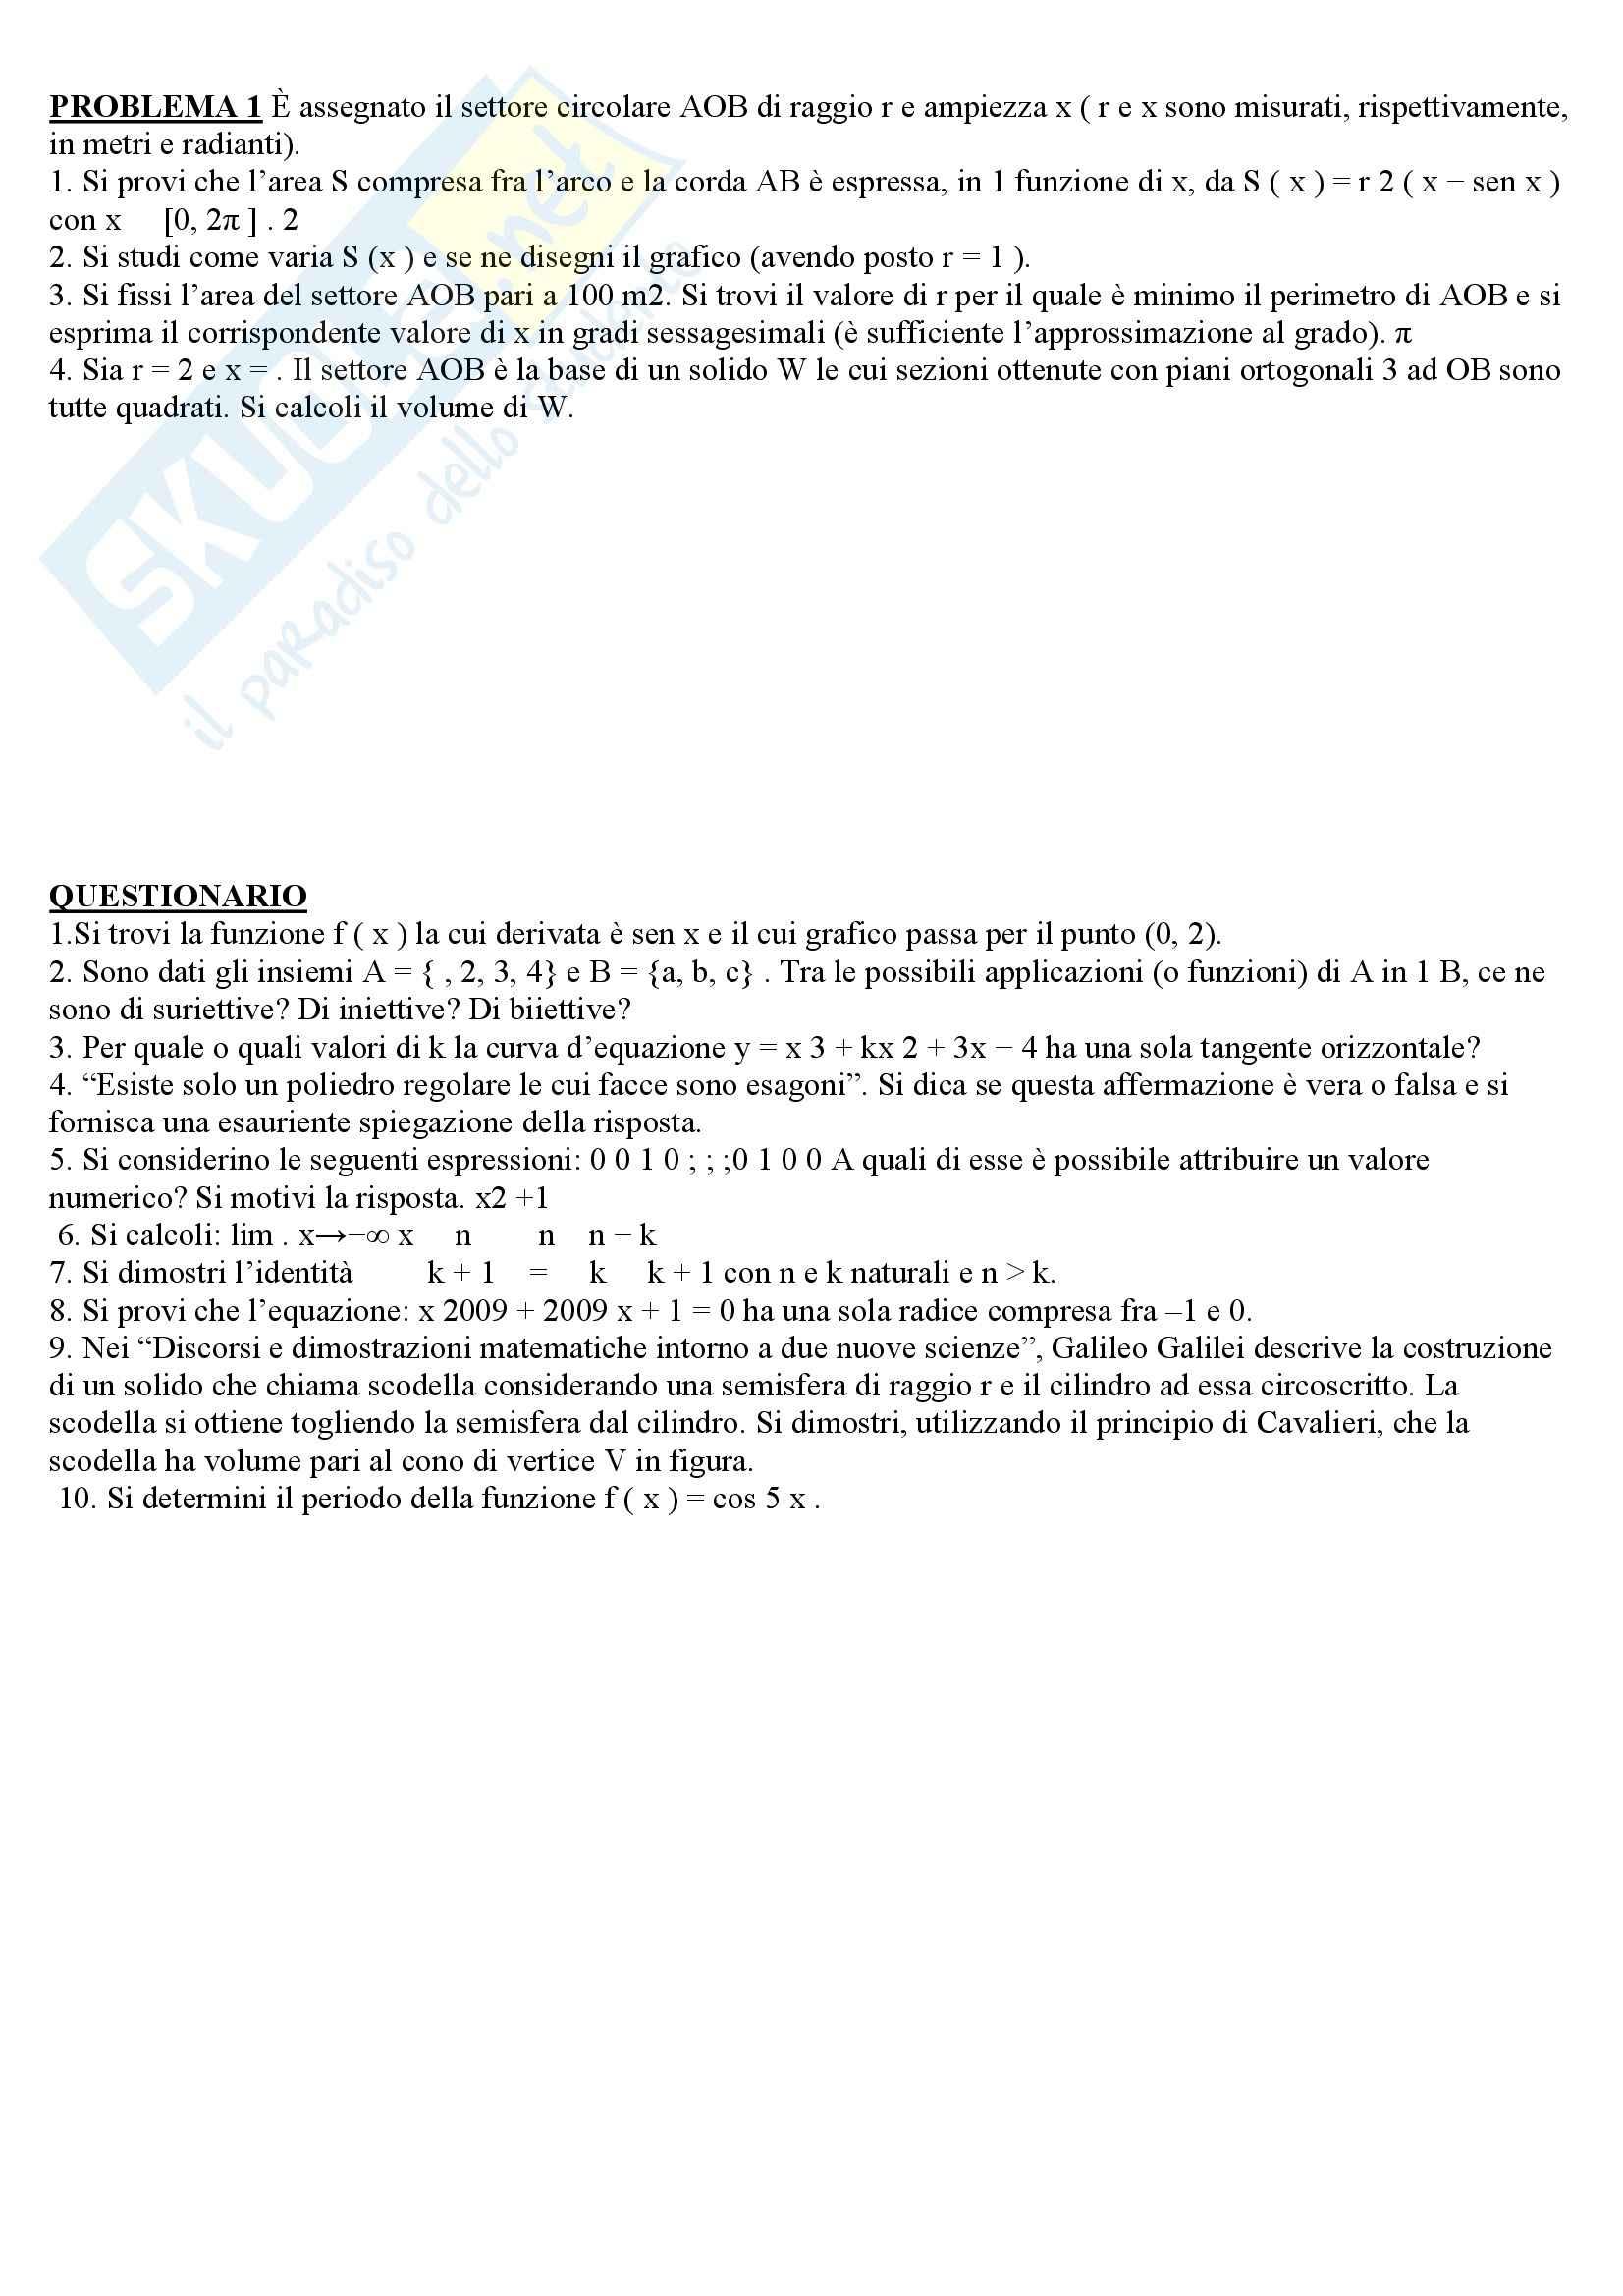 Matematica - esami di stato 2008/2009